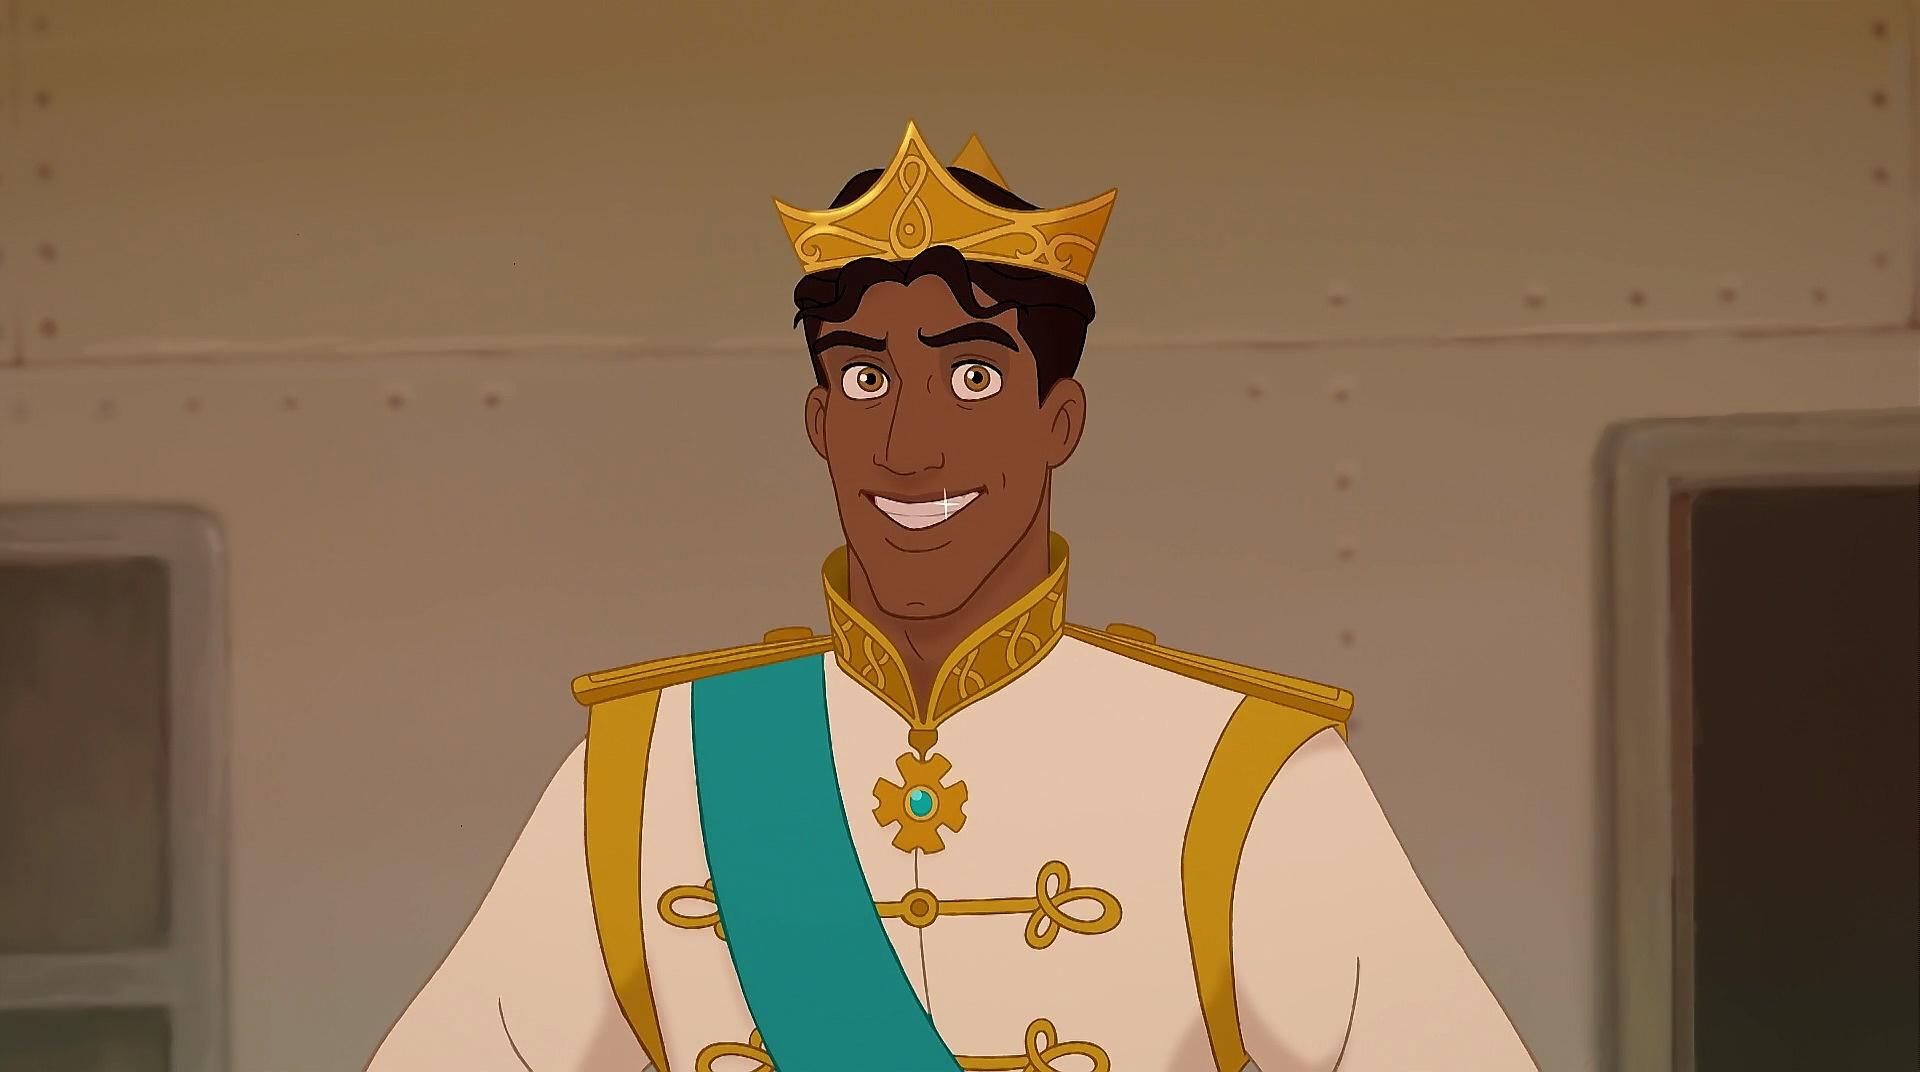 Príncipe Naveen, par romântico da Princesa Tiana.